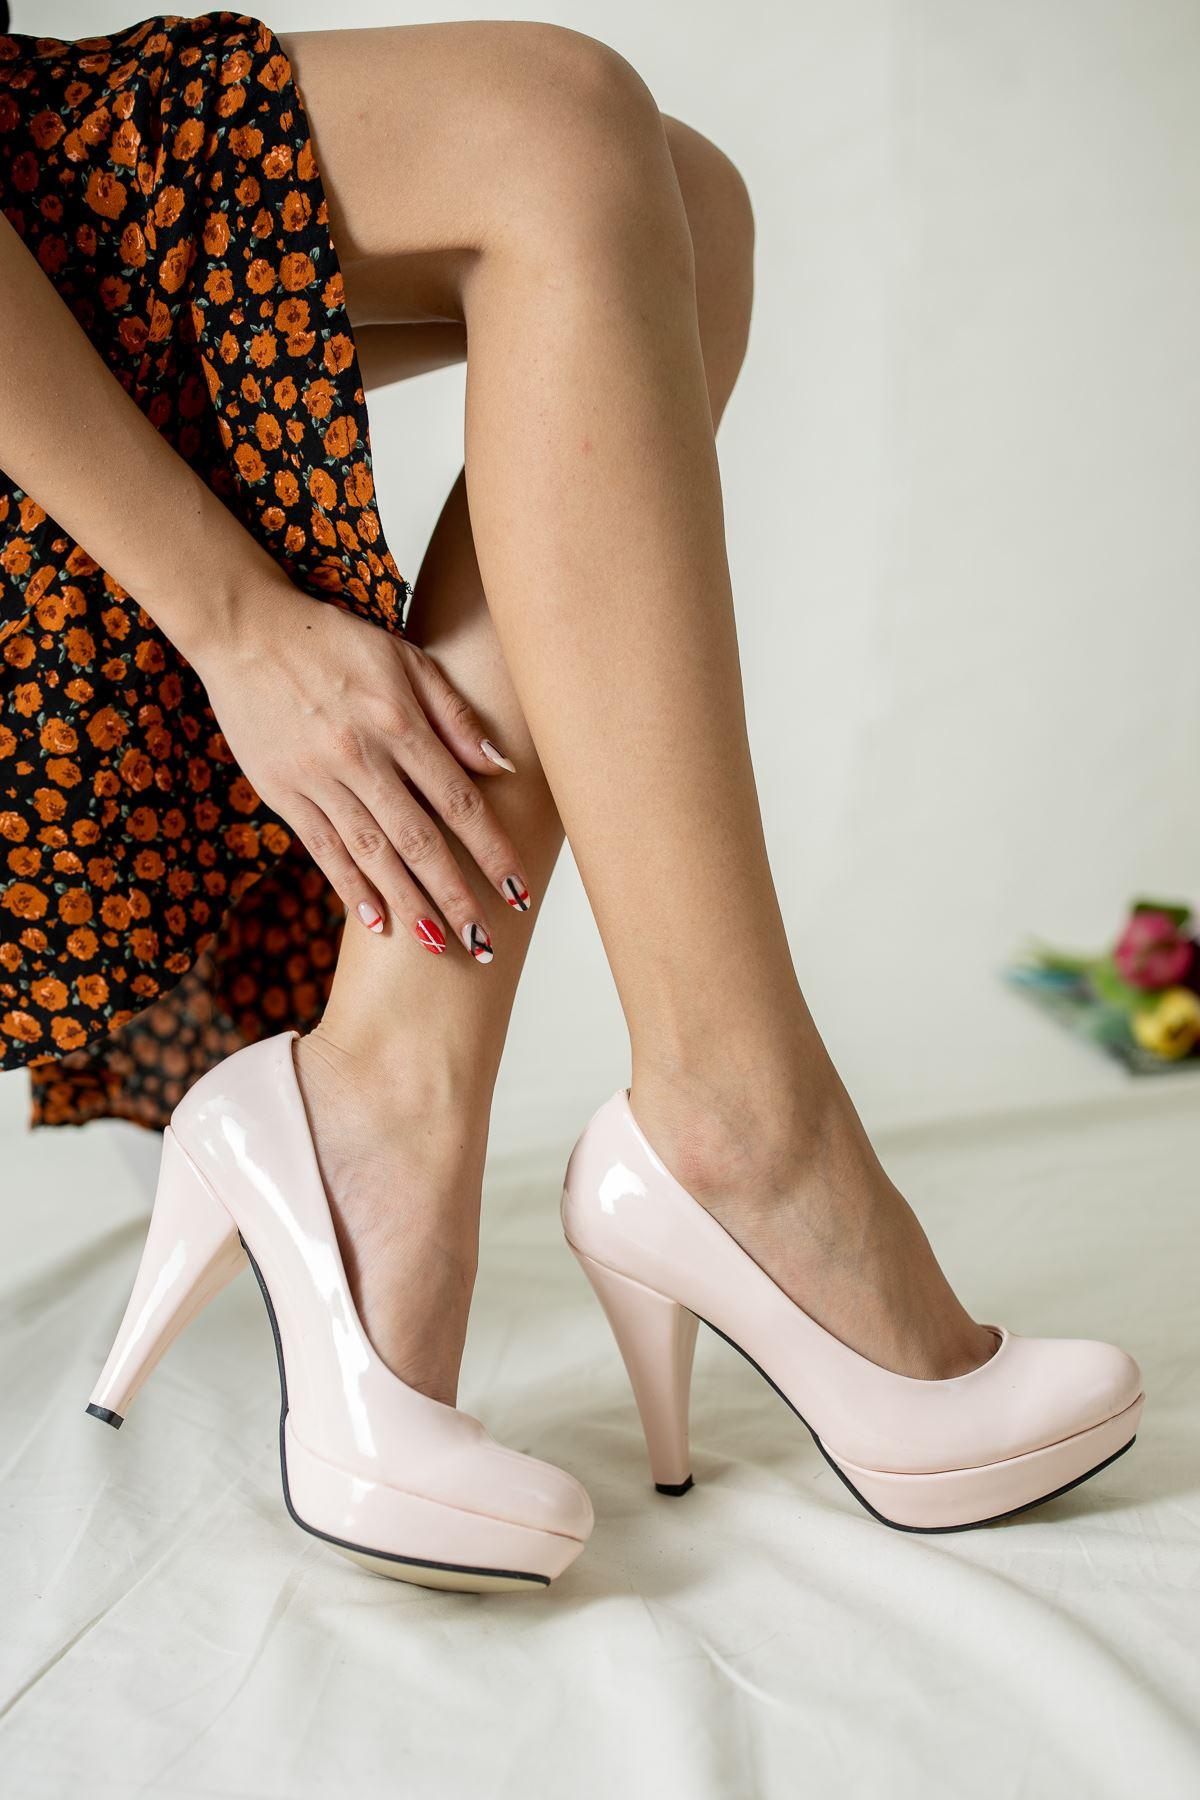 Çift Platform Topuklu Ayakkabı